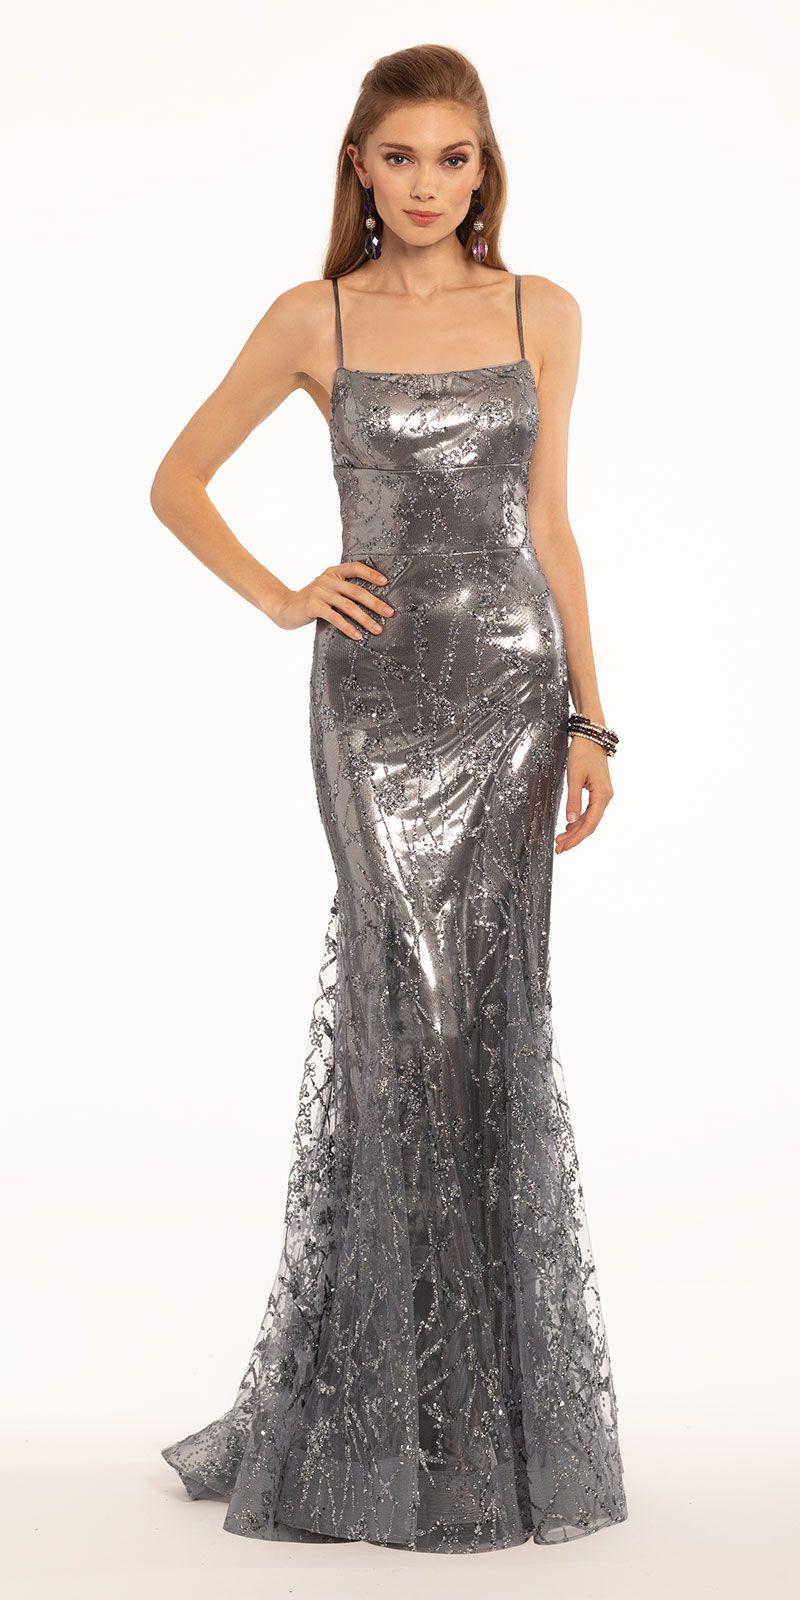 Glitter Mesh Foil Lace Up Back Dress Lace Up Back Dress Black Tie Wedding Guest Dress Dresses [ 1600 x 800 Pixel ]